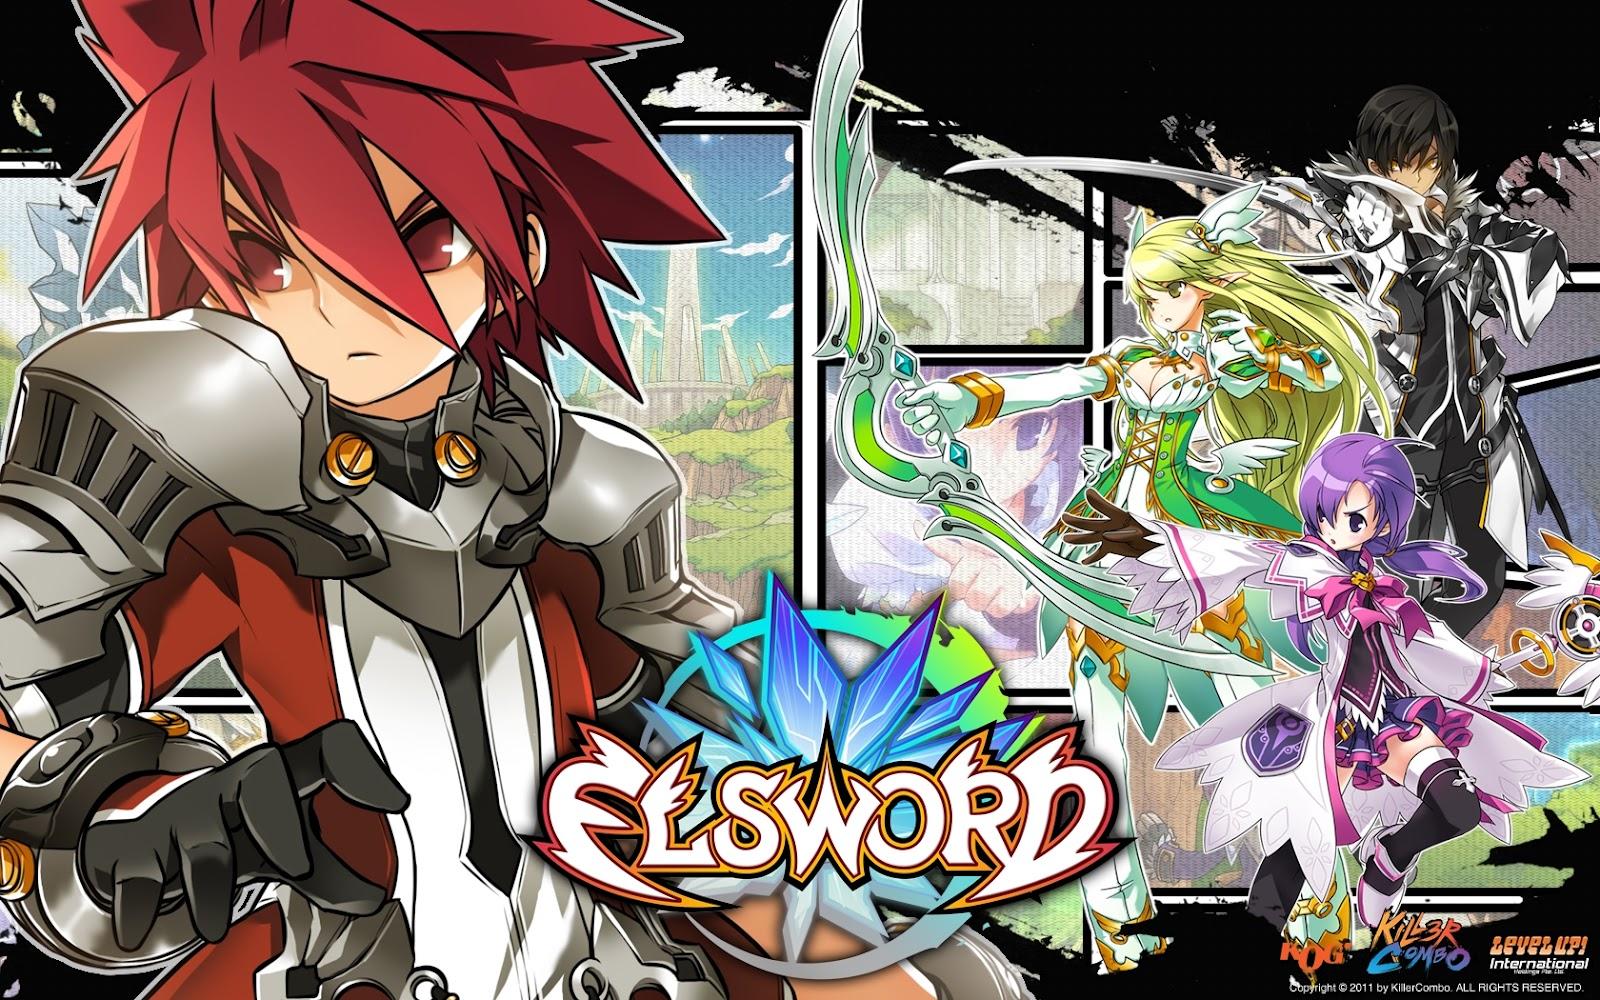 Eslword